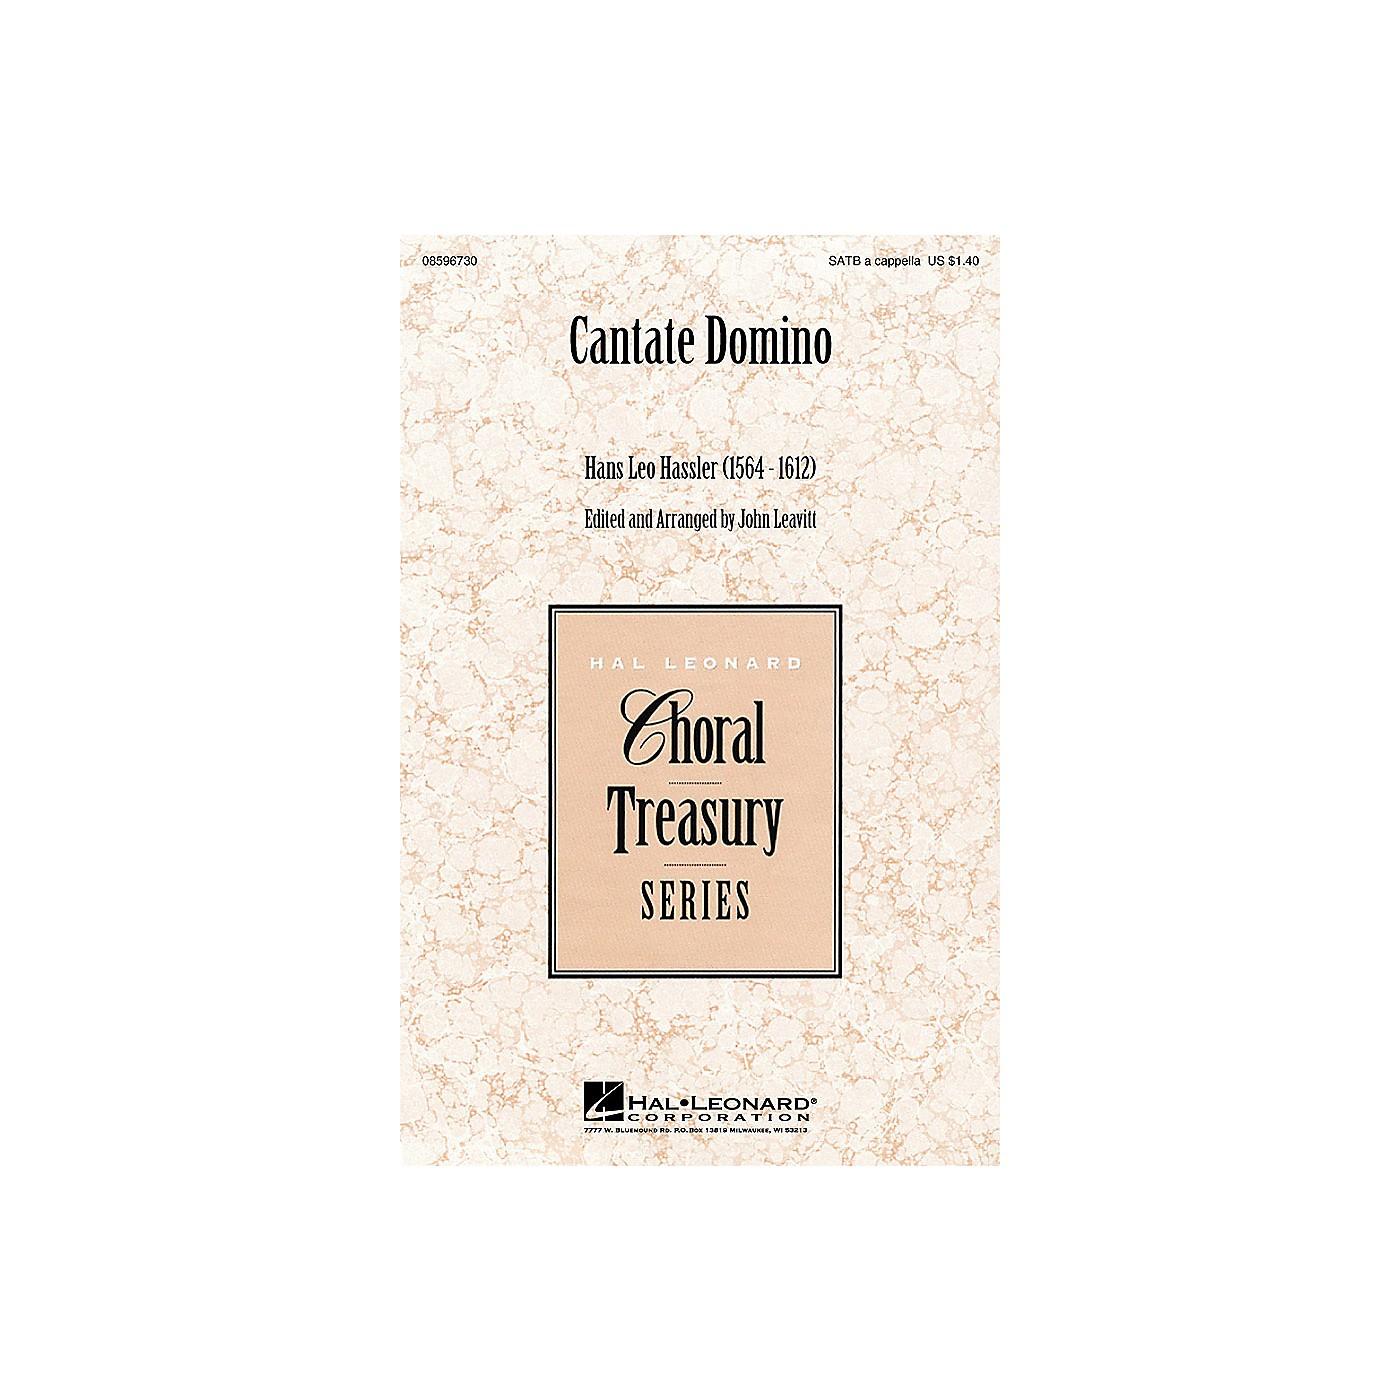 Hal Leonard Cantate Domino SATB a cappella arranged by John Leavitt thumbnail